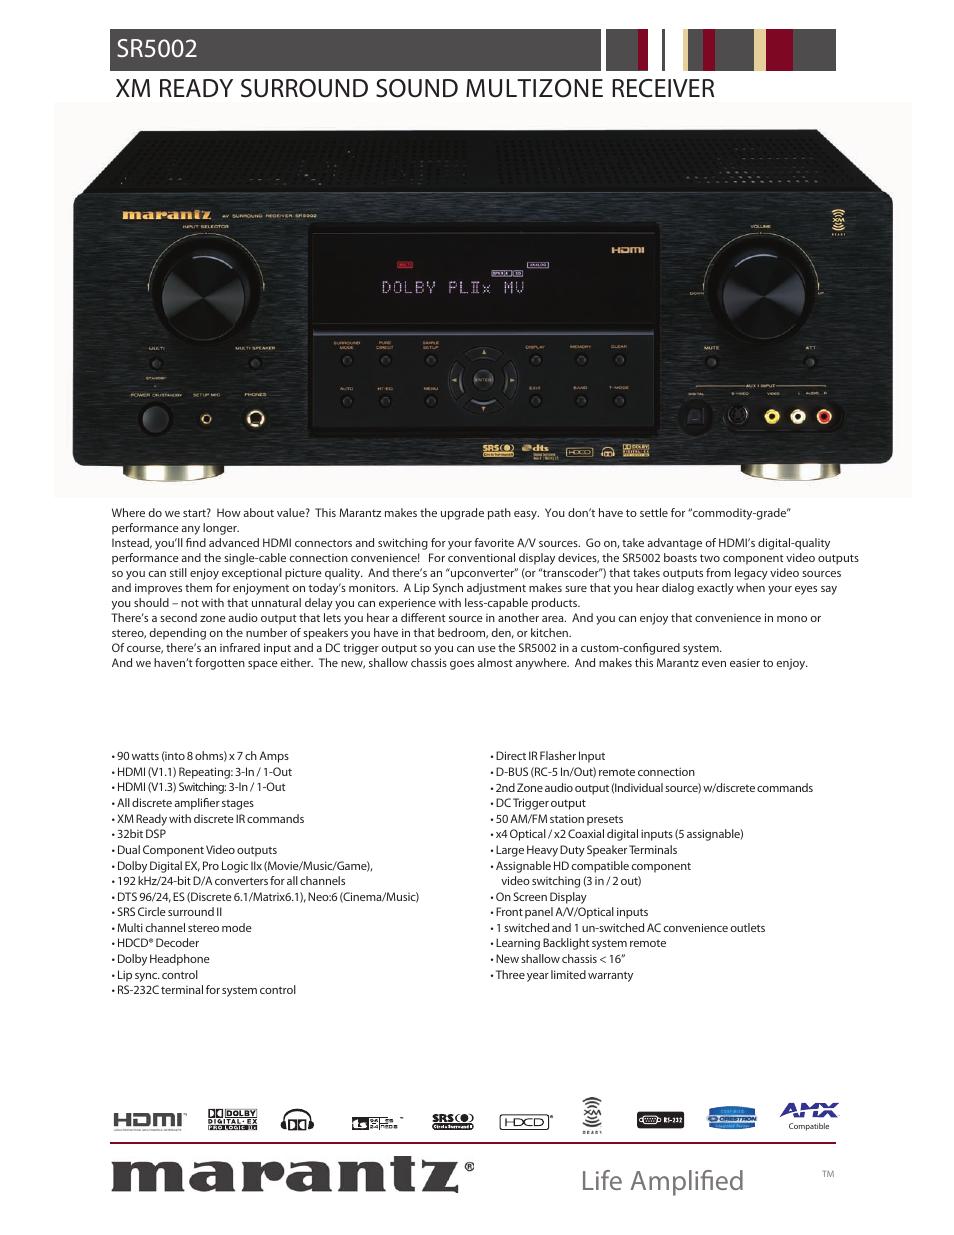 marantz sr5002 user manual 2 pages rh manualsdir com Marantz SR5002 Receiver marantz sr5002 manual pdf